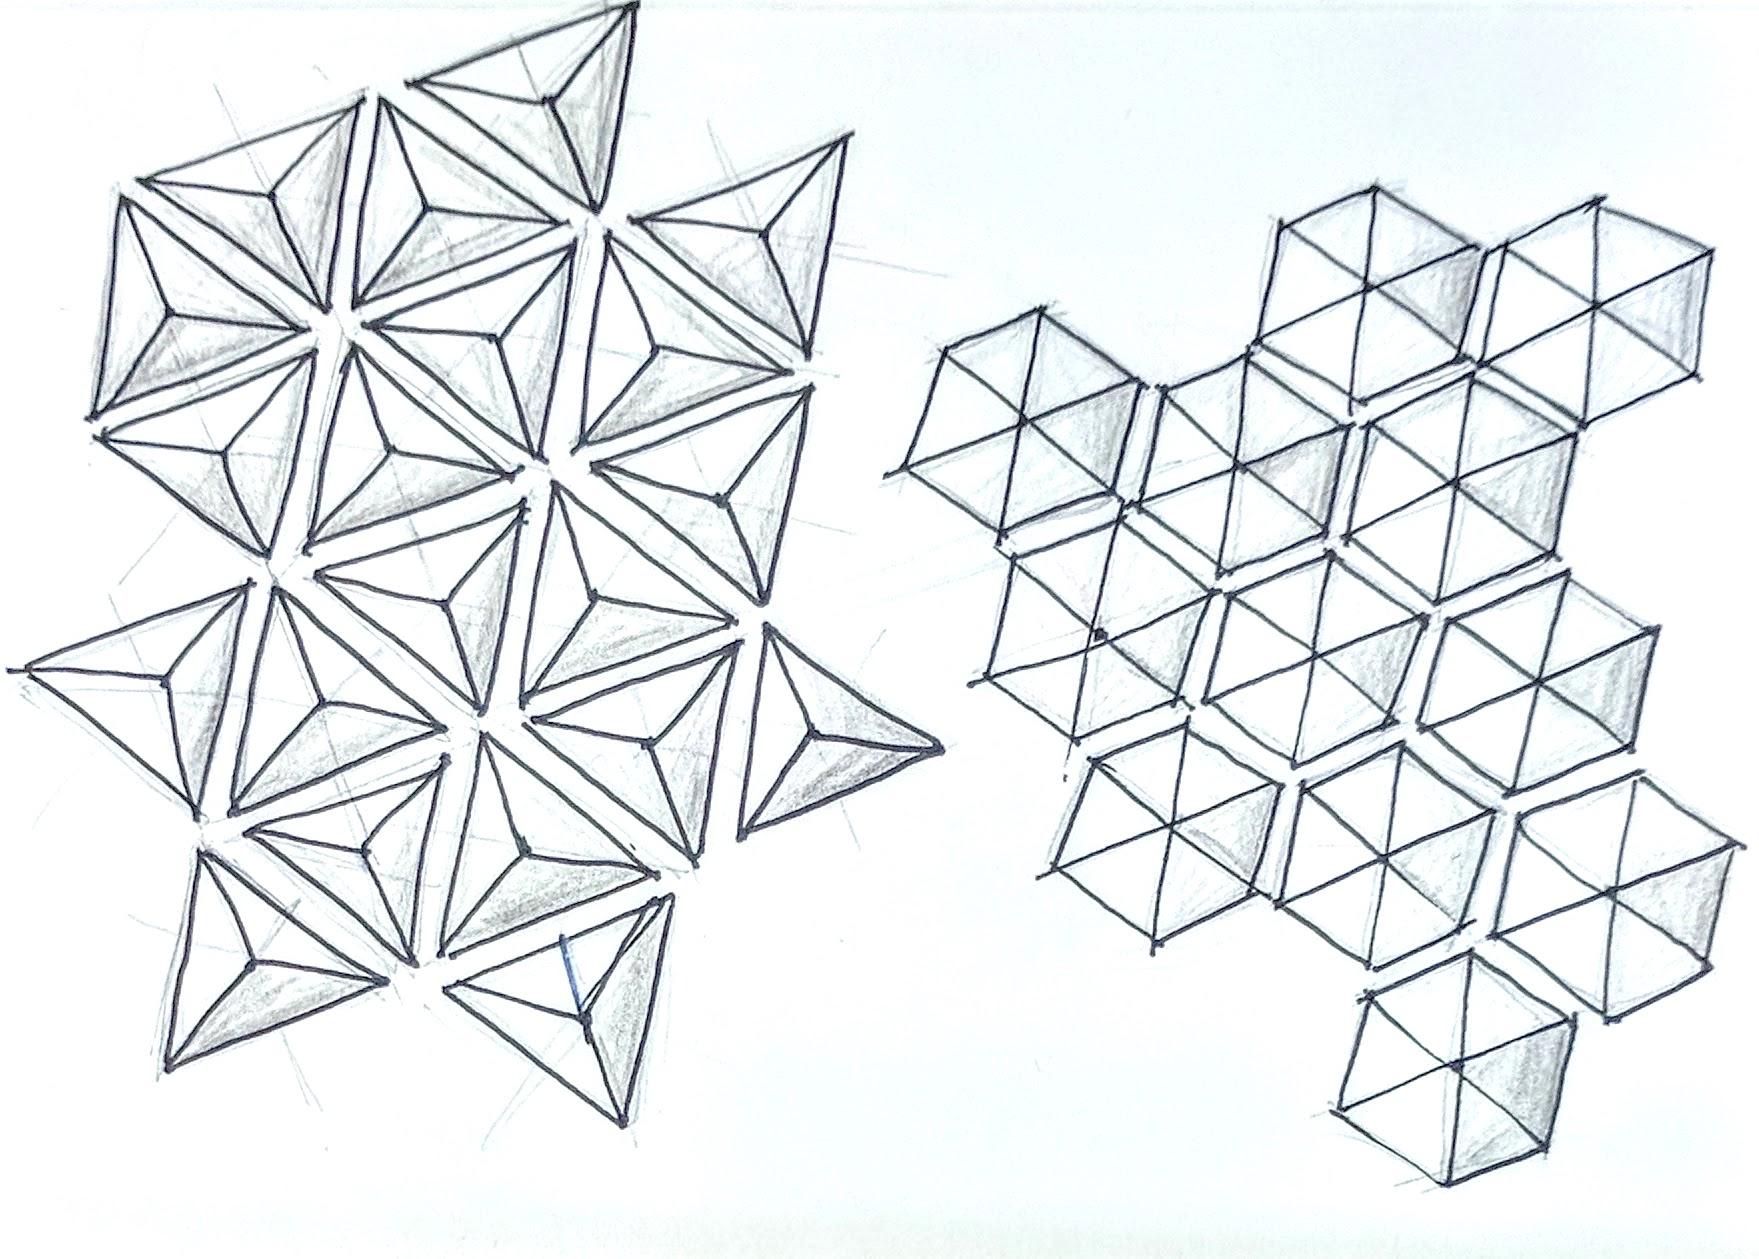 W6_Sketches inspiration.jpg